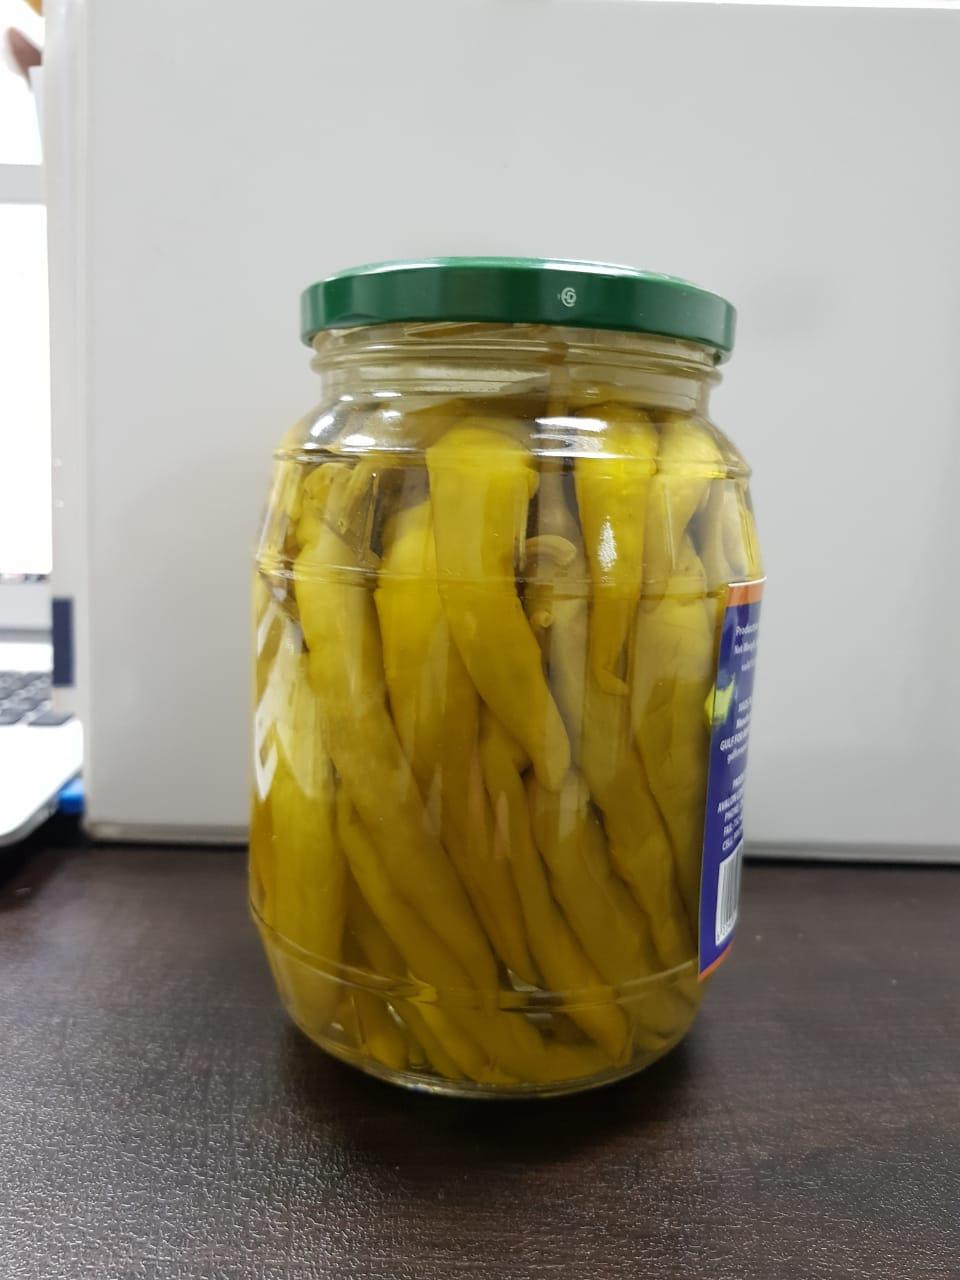 Chili pepper Pickles